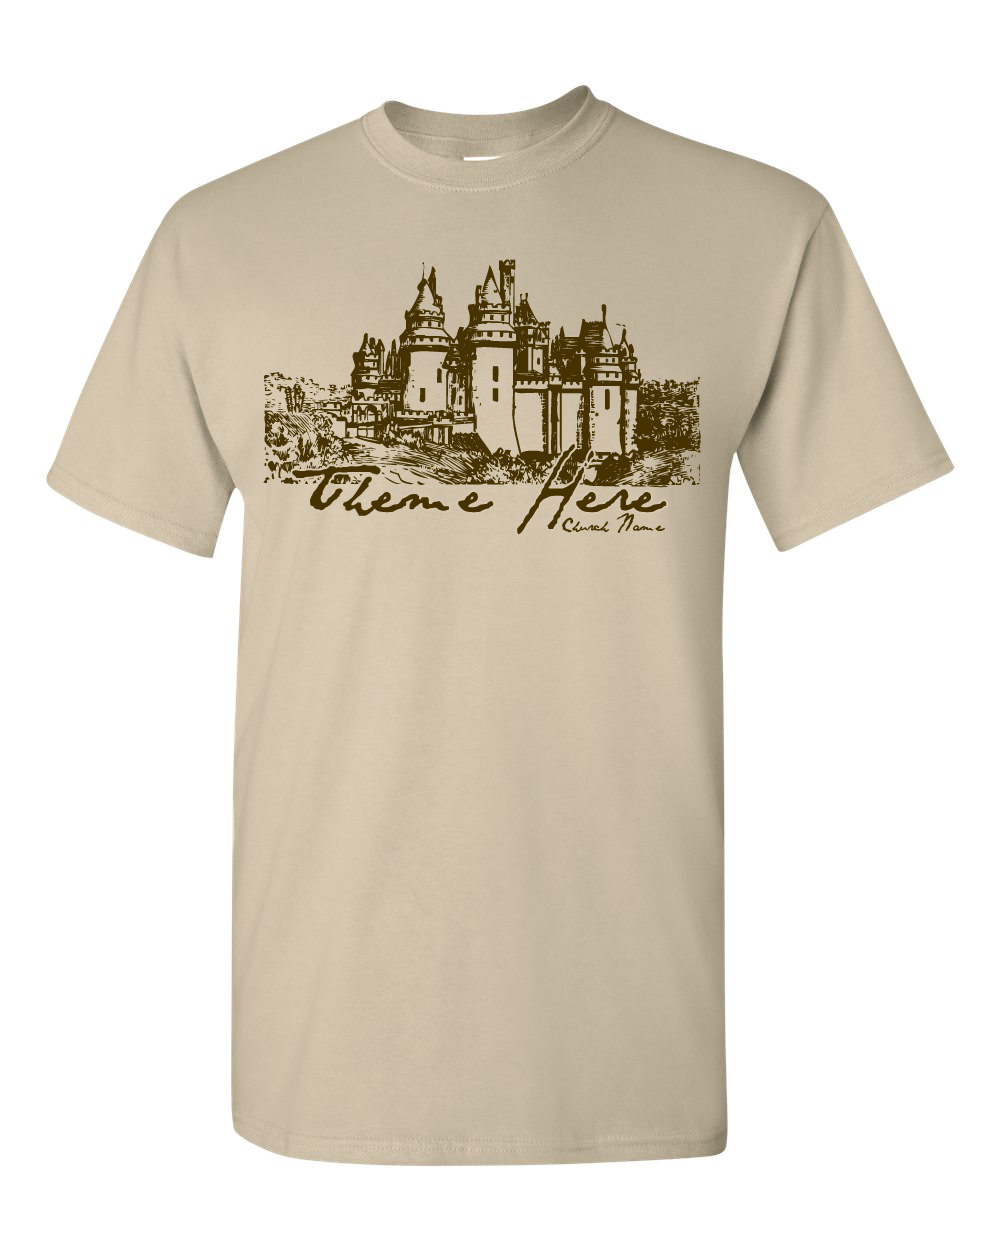 Castle 4-01.jpg